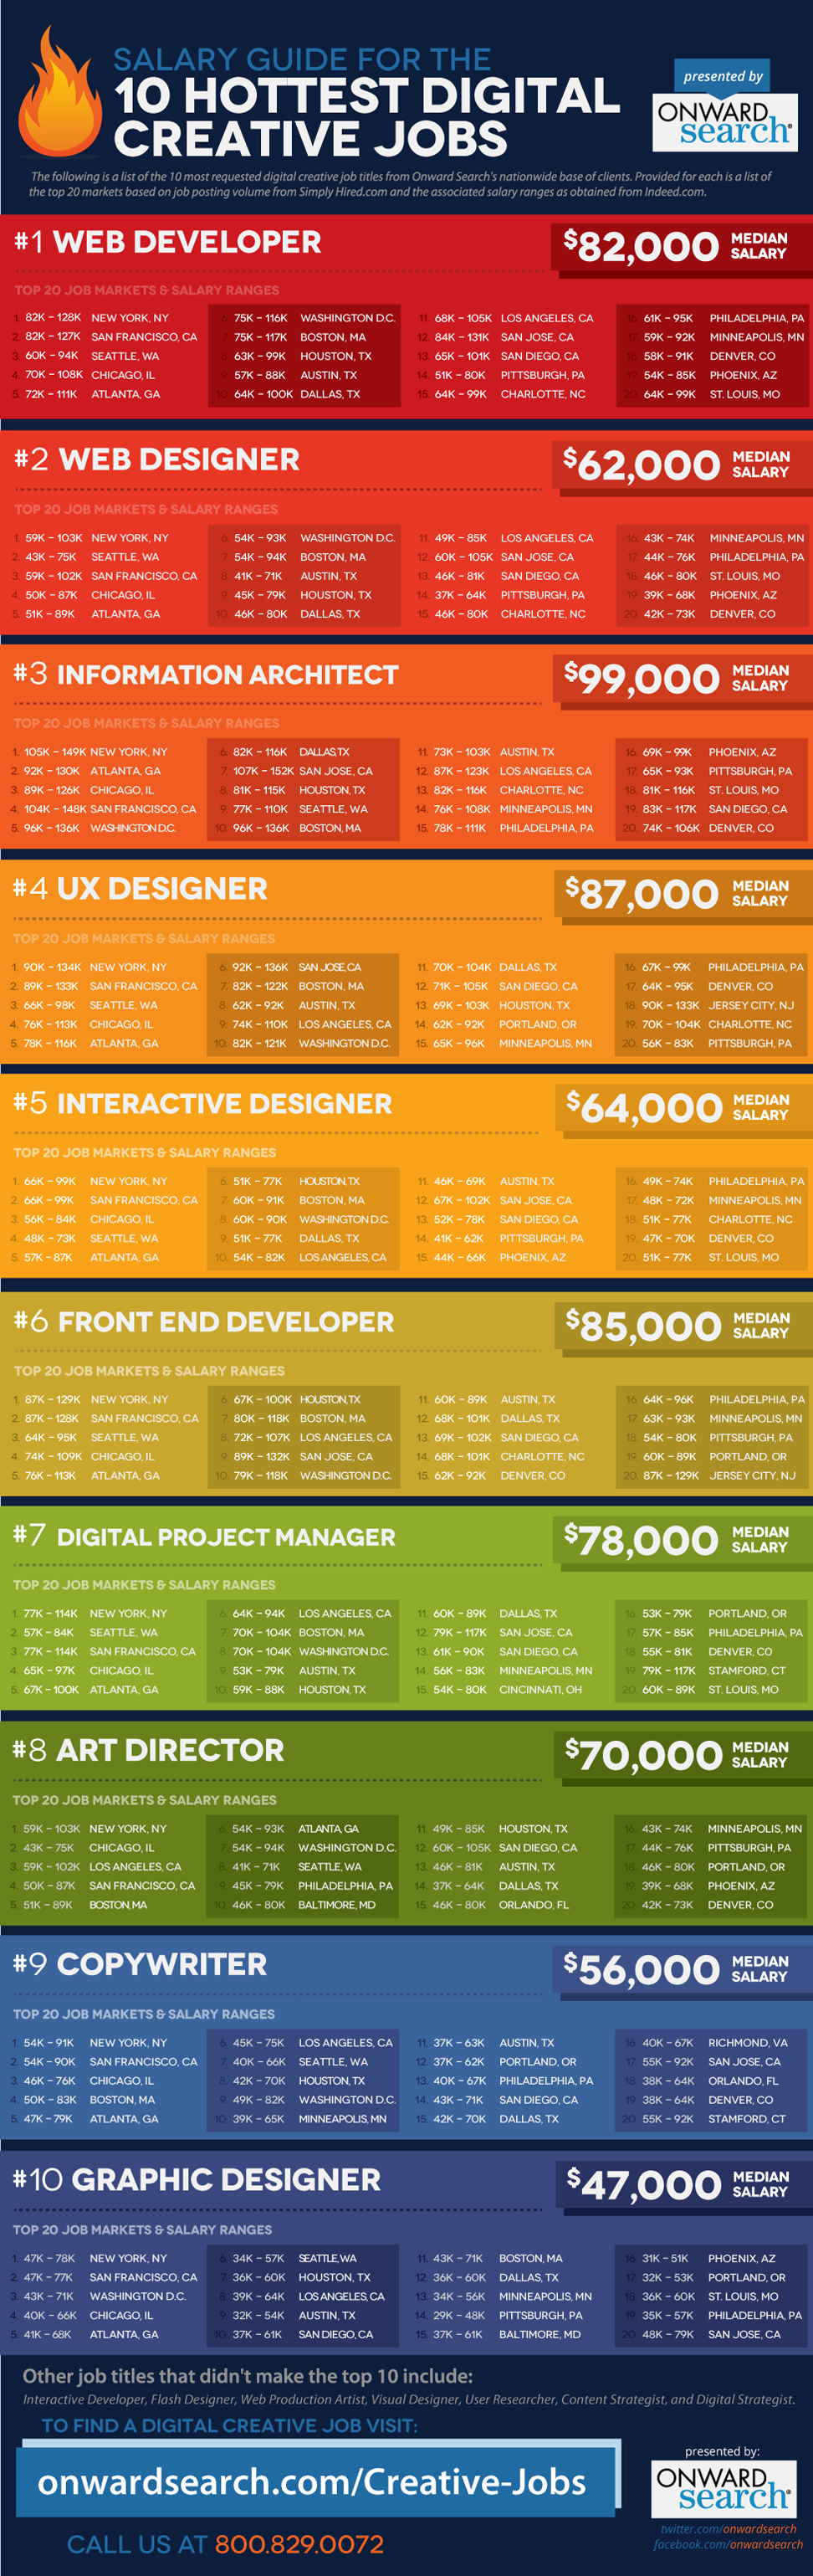 Digital Creative Jobs Salary Guide Creative Jobs Salary Guide Digital Jobs